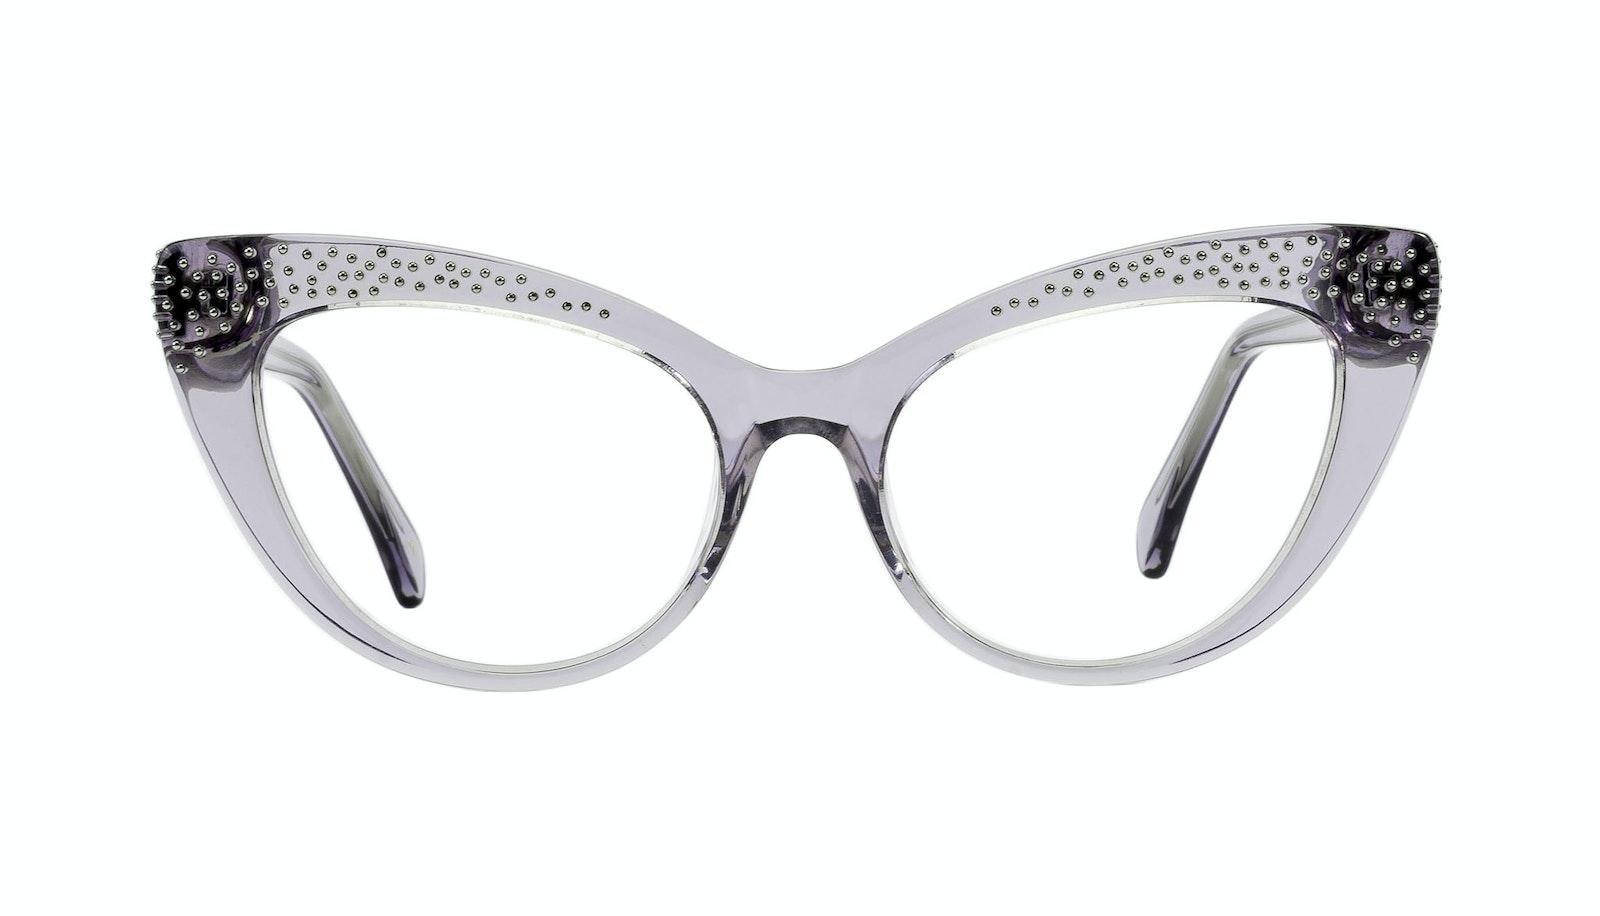 00a11e778f8 Affordable Fashion Glasses Cat Eye Daring Cateye Eyeglasses Women Keiko Moe  May